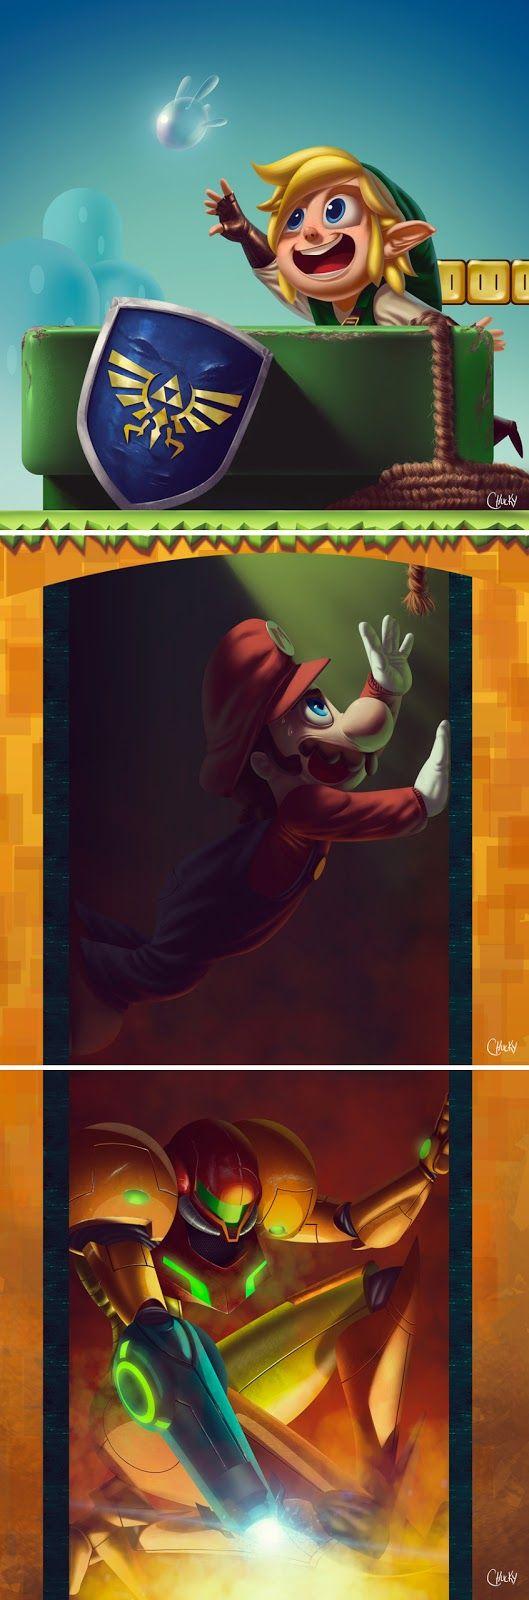 Bottleneck The Legend of Zelda, Super Mario e Metroid by Ricardo Chucky. via: http://www.chucky.com.br/